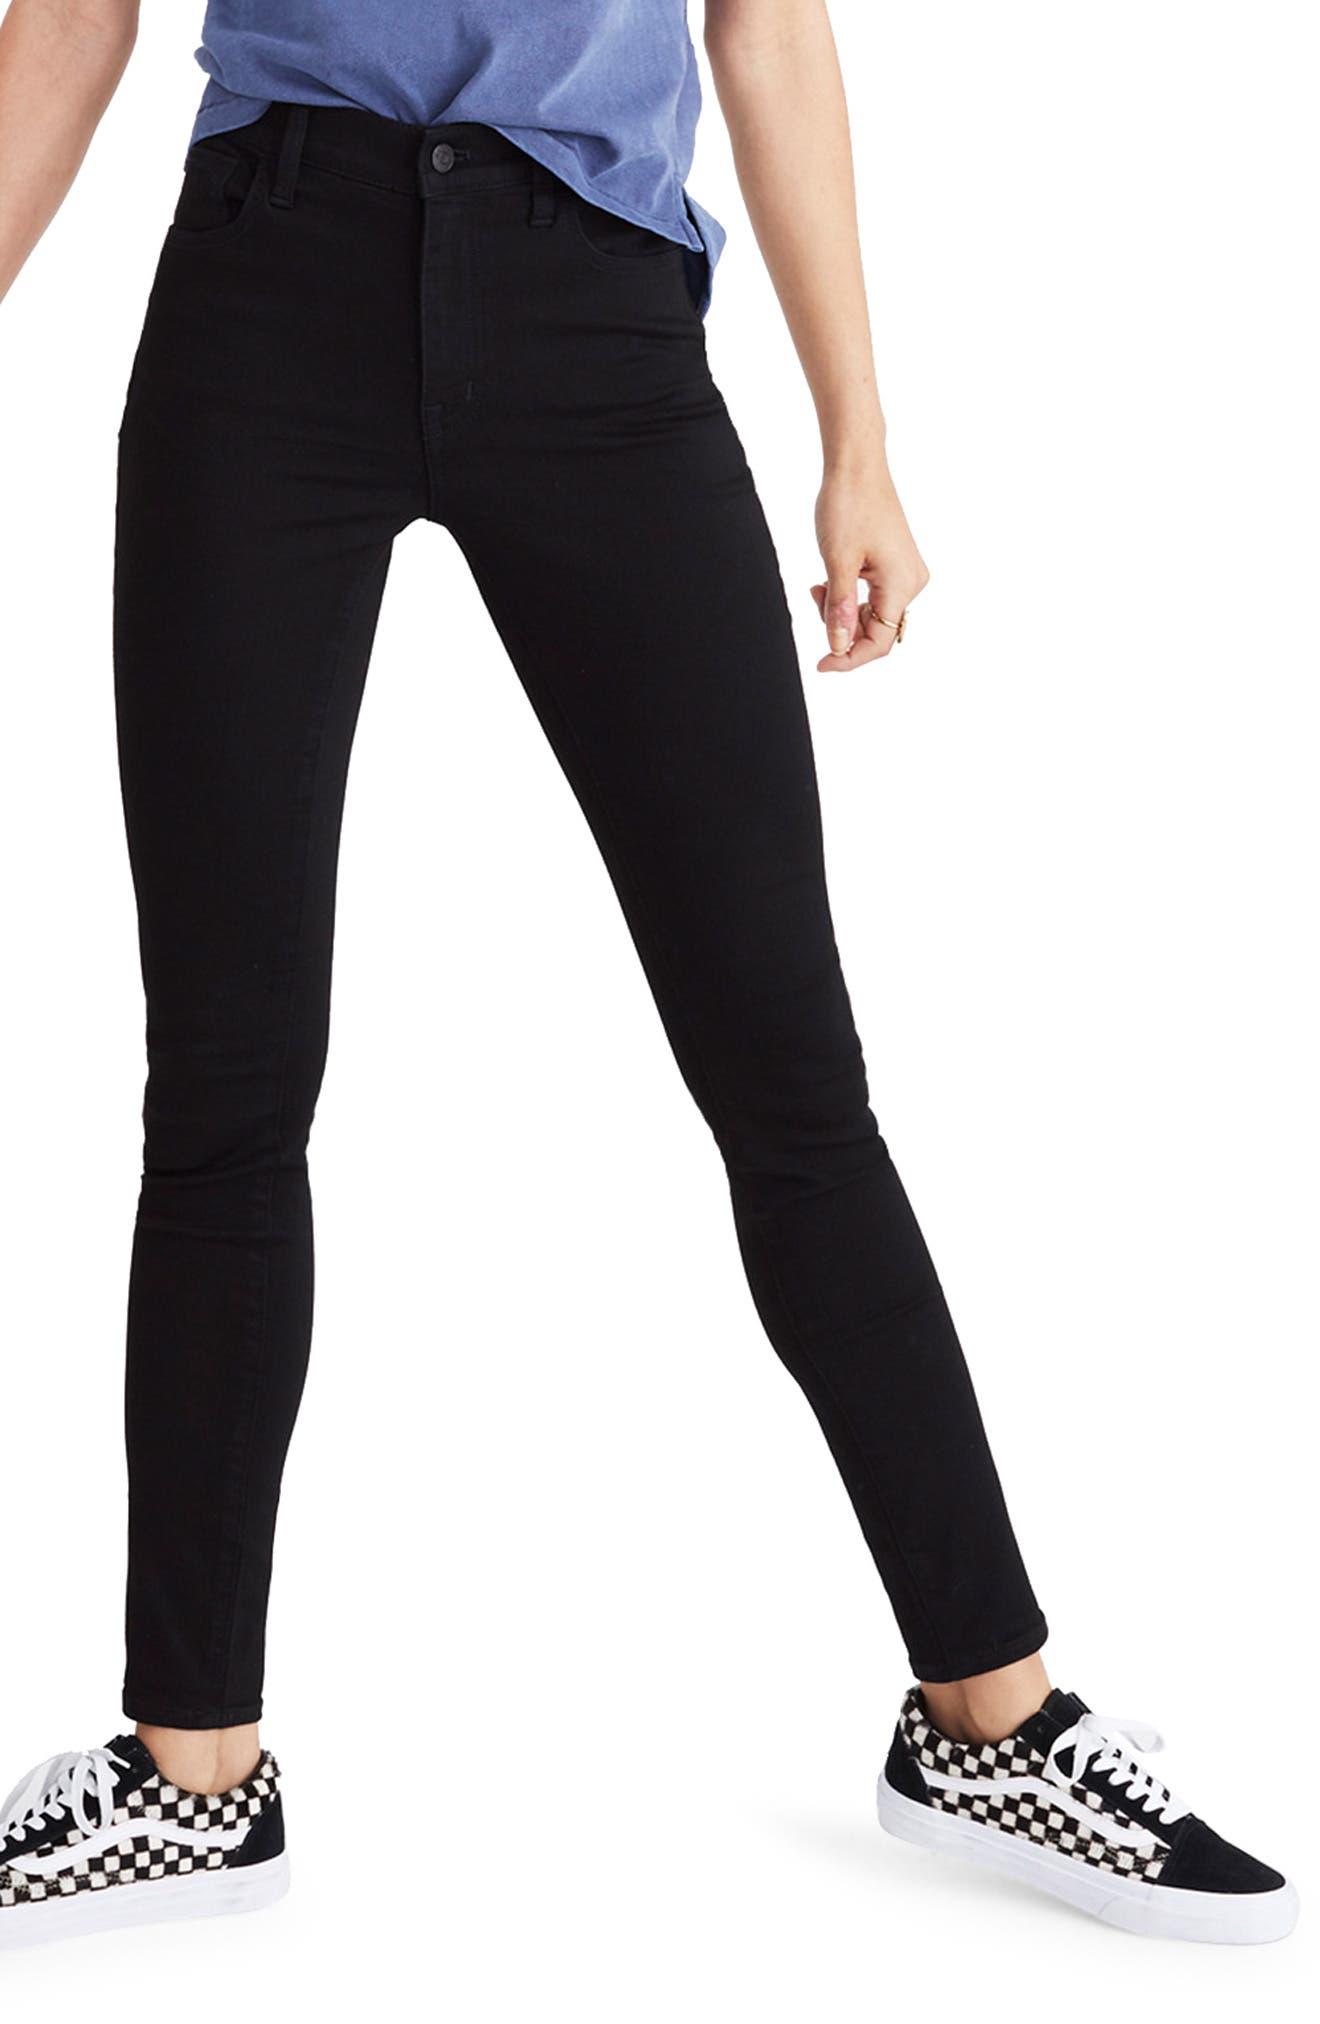 Roadtripper Skinny Jeans,                         Main,                         color, BENNET WASH